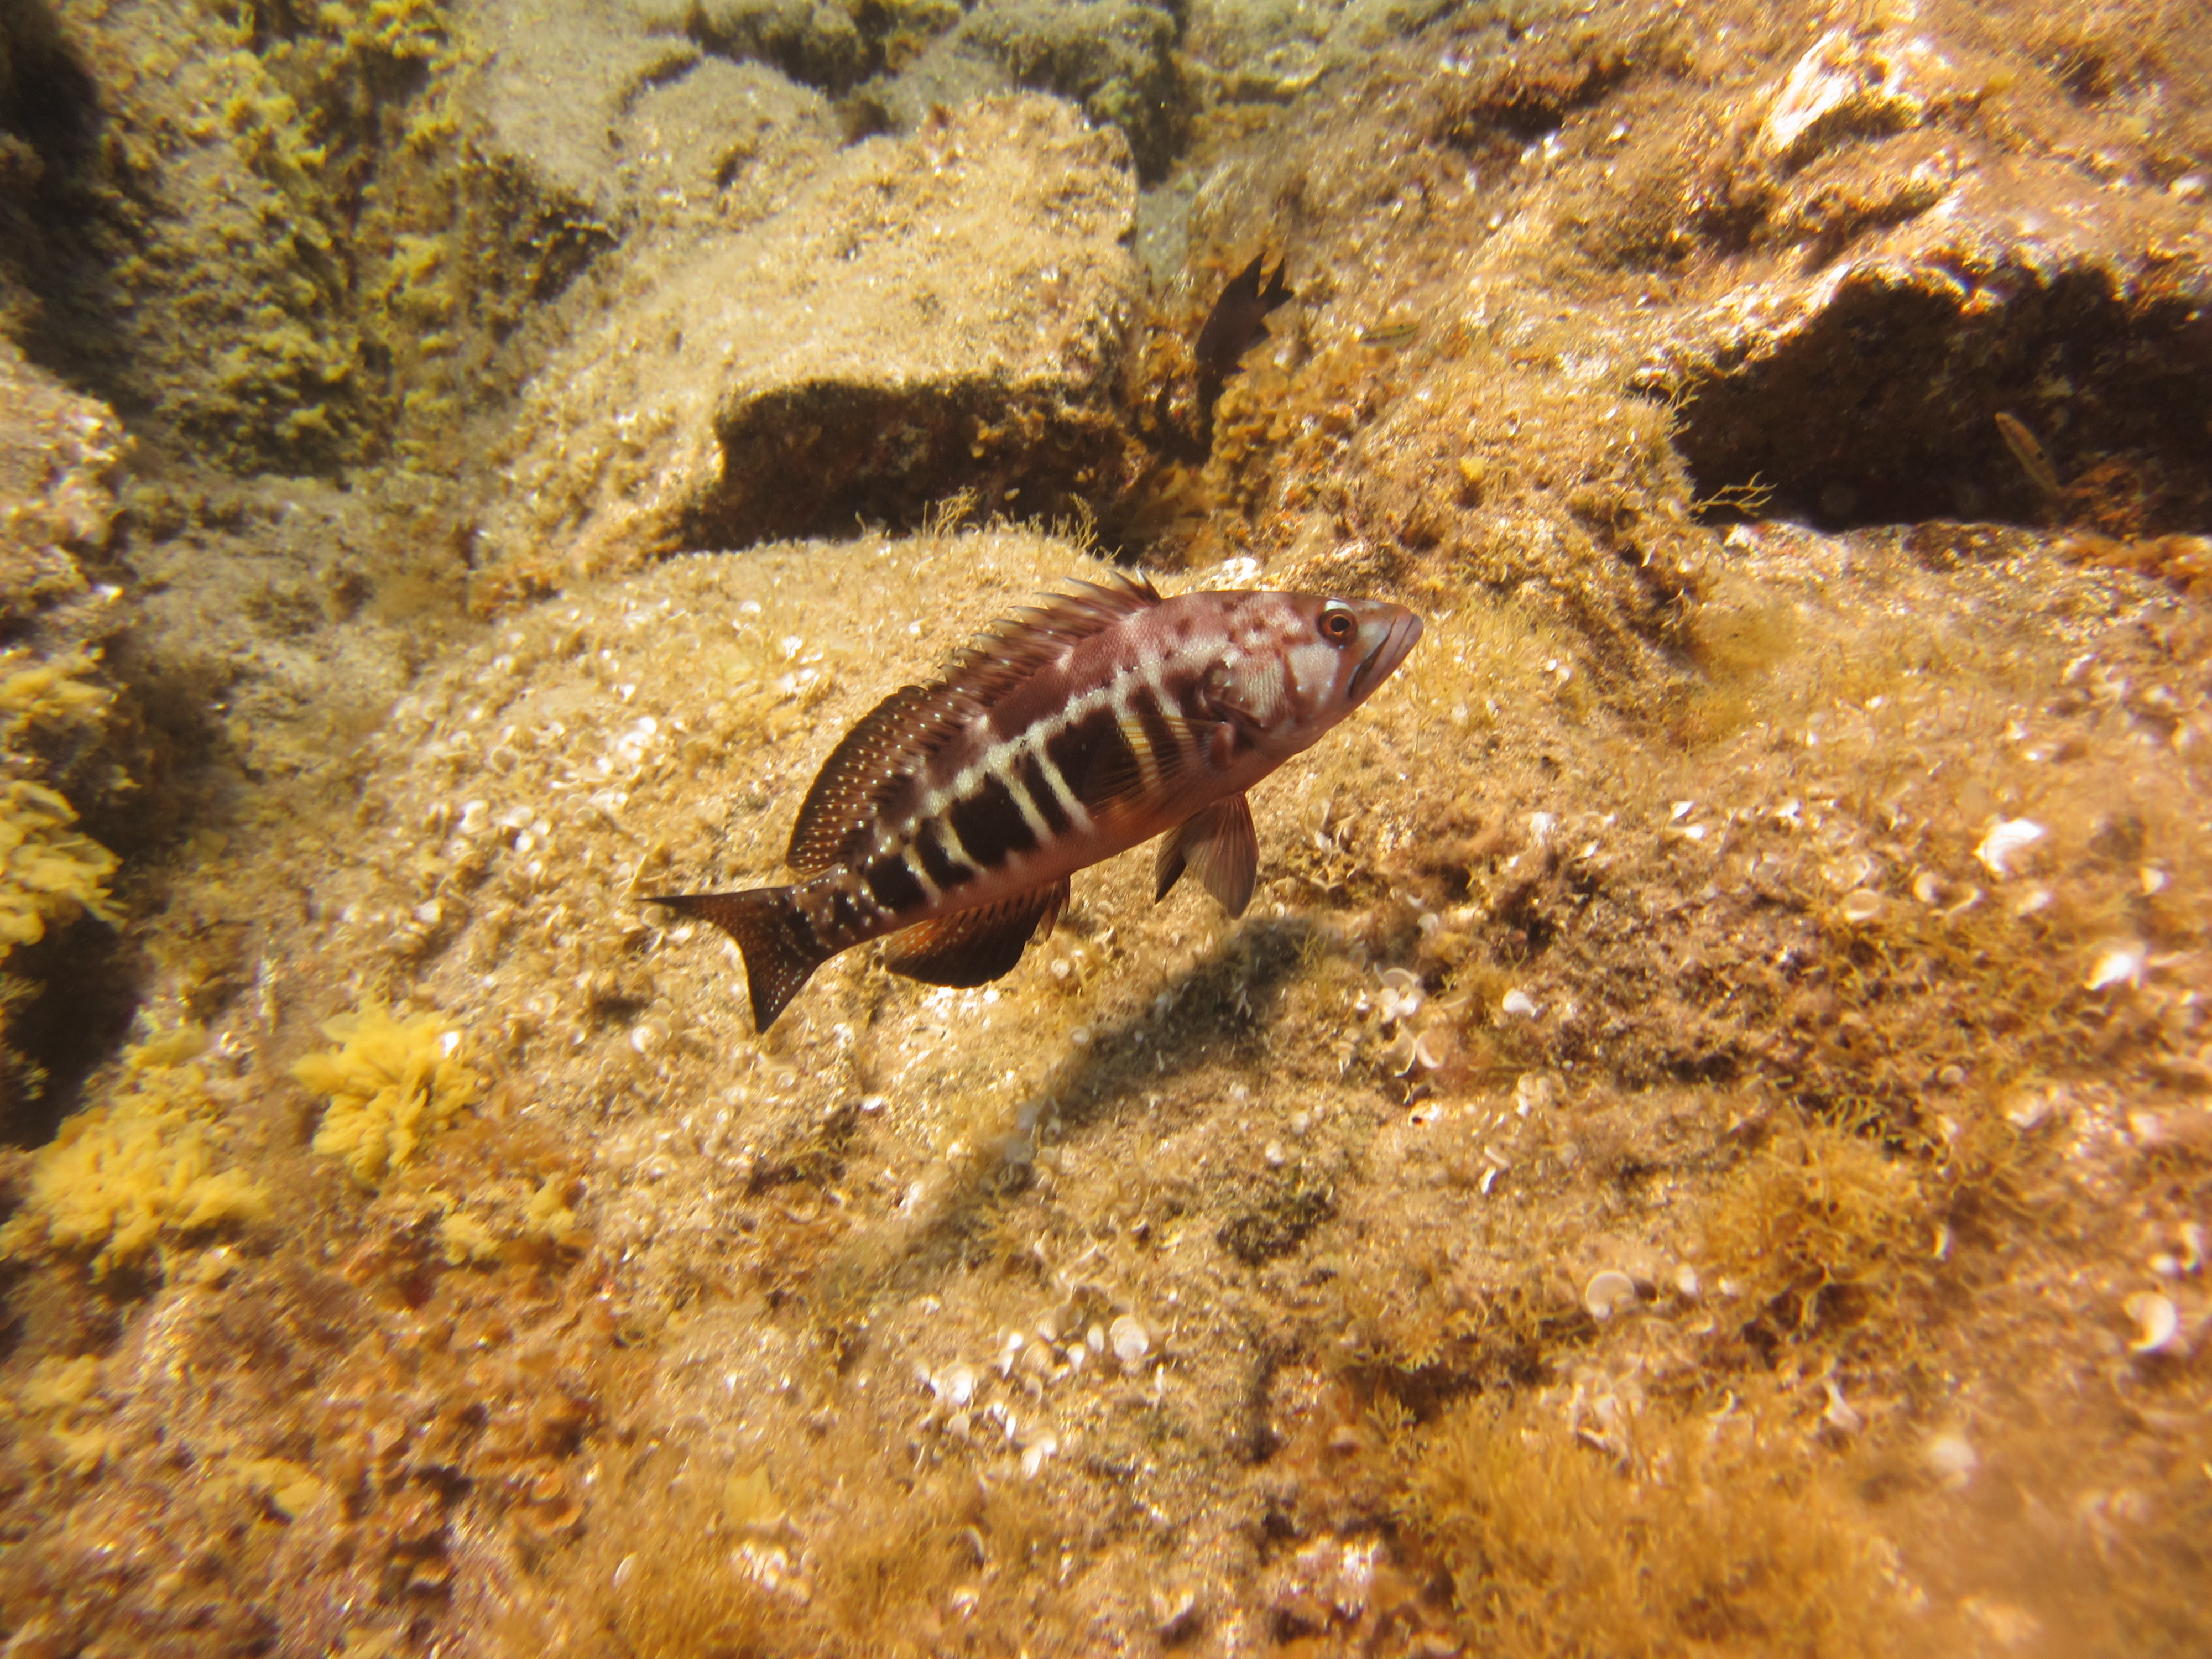 Diving-Tenerife-Aquatic-Life-Sharks-Sting-Rays-Fish (58)